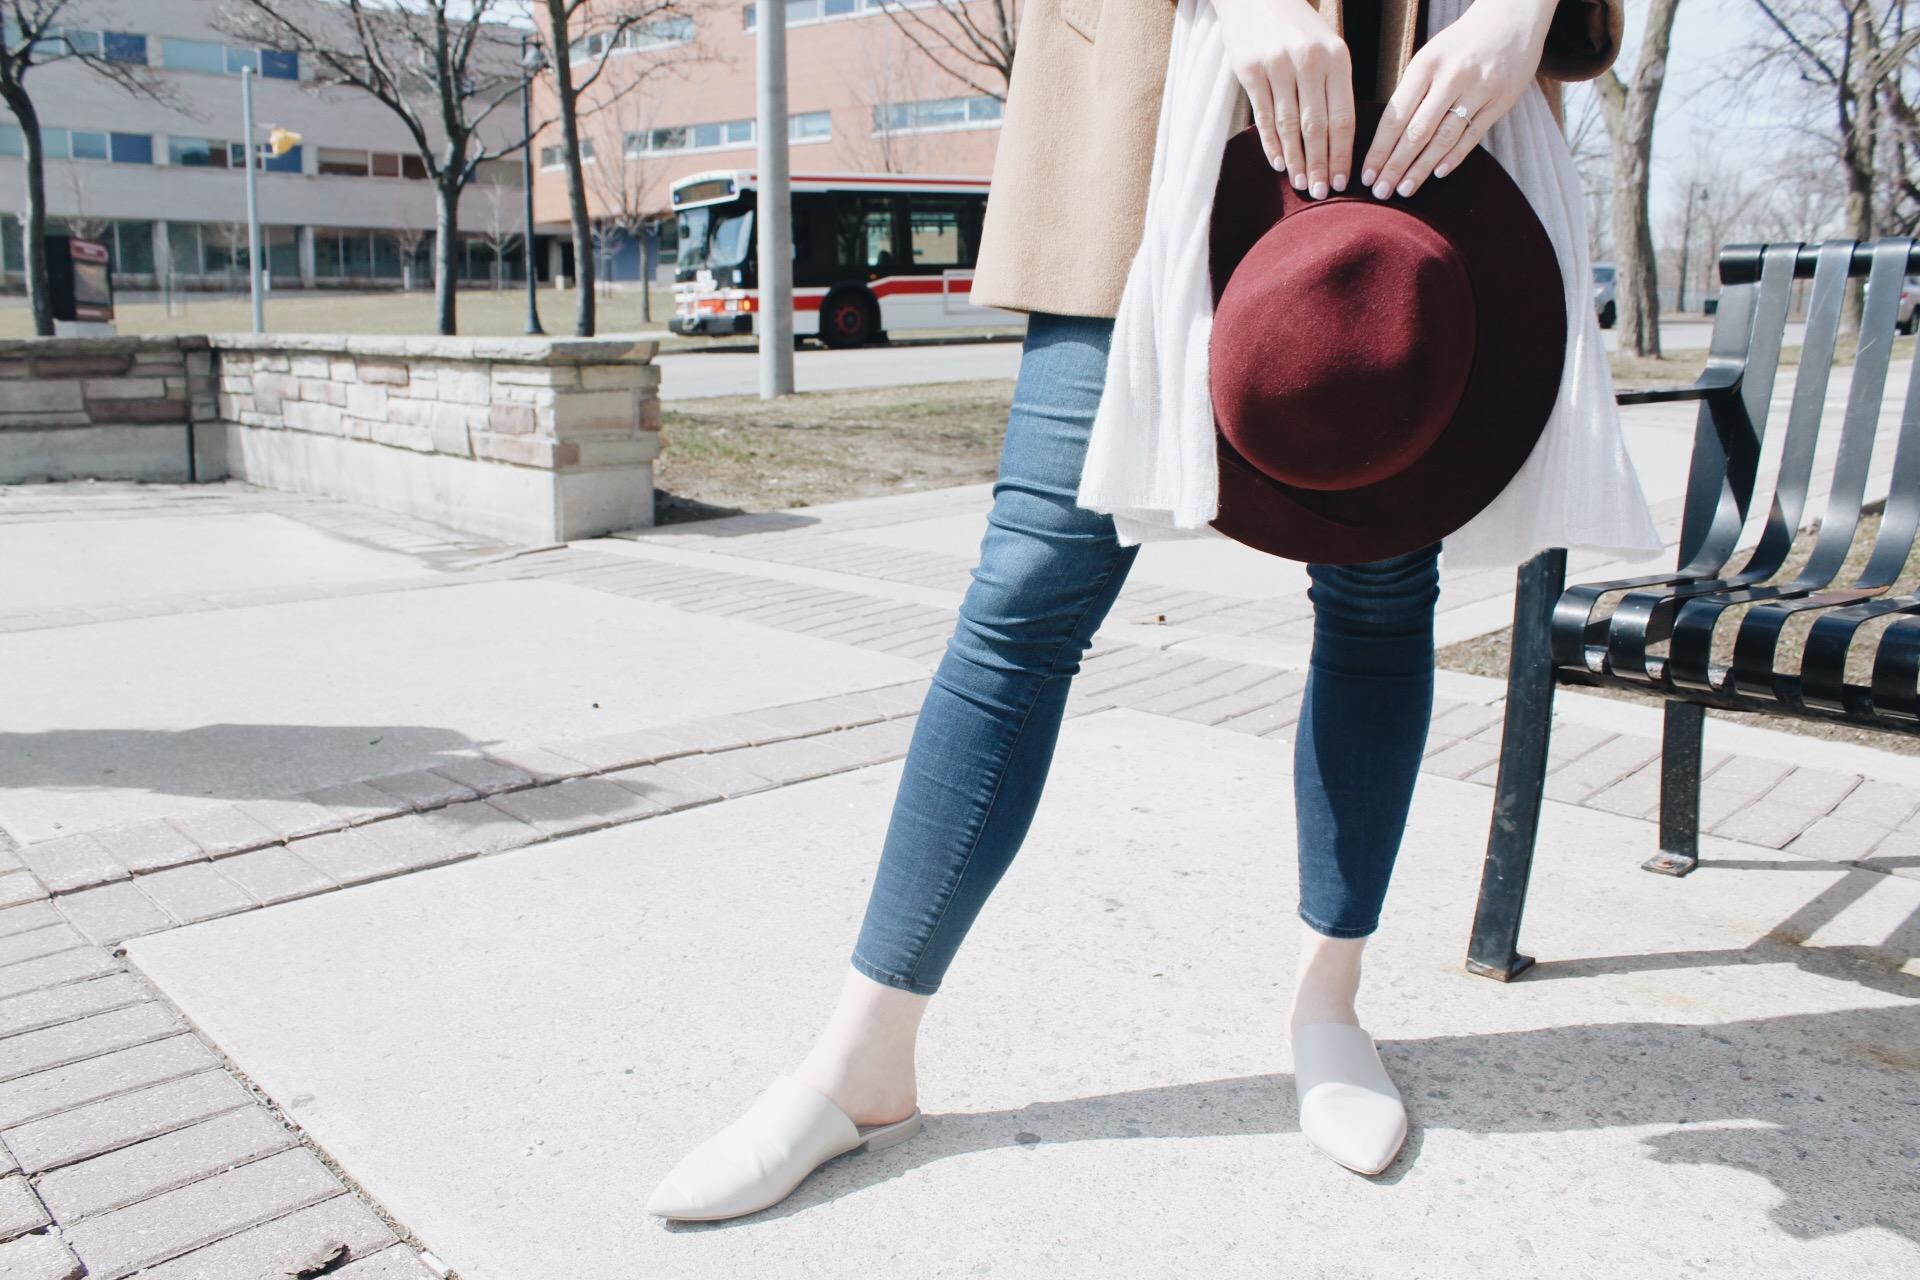 Le chateau burgundy hat, Oak + Fort grey flats, Buffalo jeans, FashionHumber, Fashion, student, streetwear, campus street style, 2017